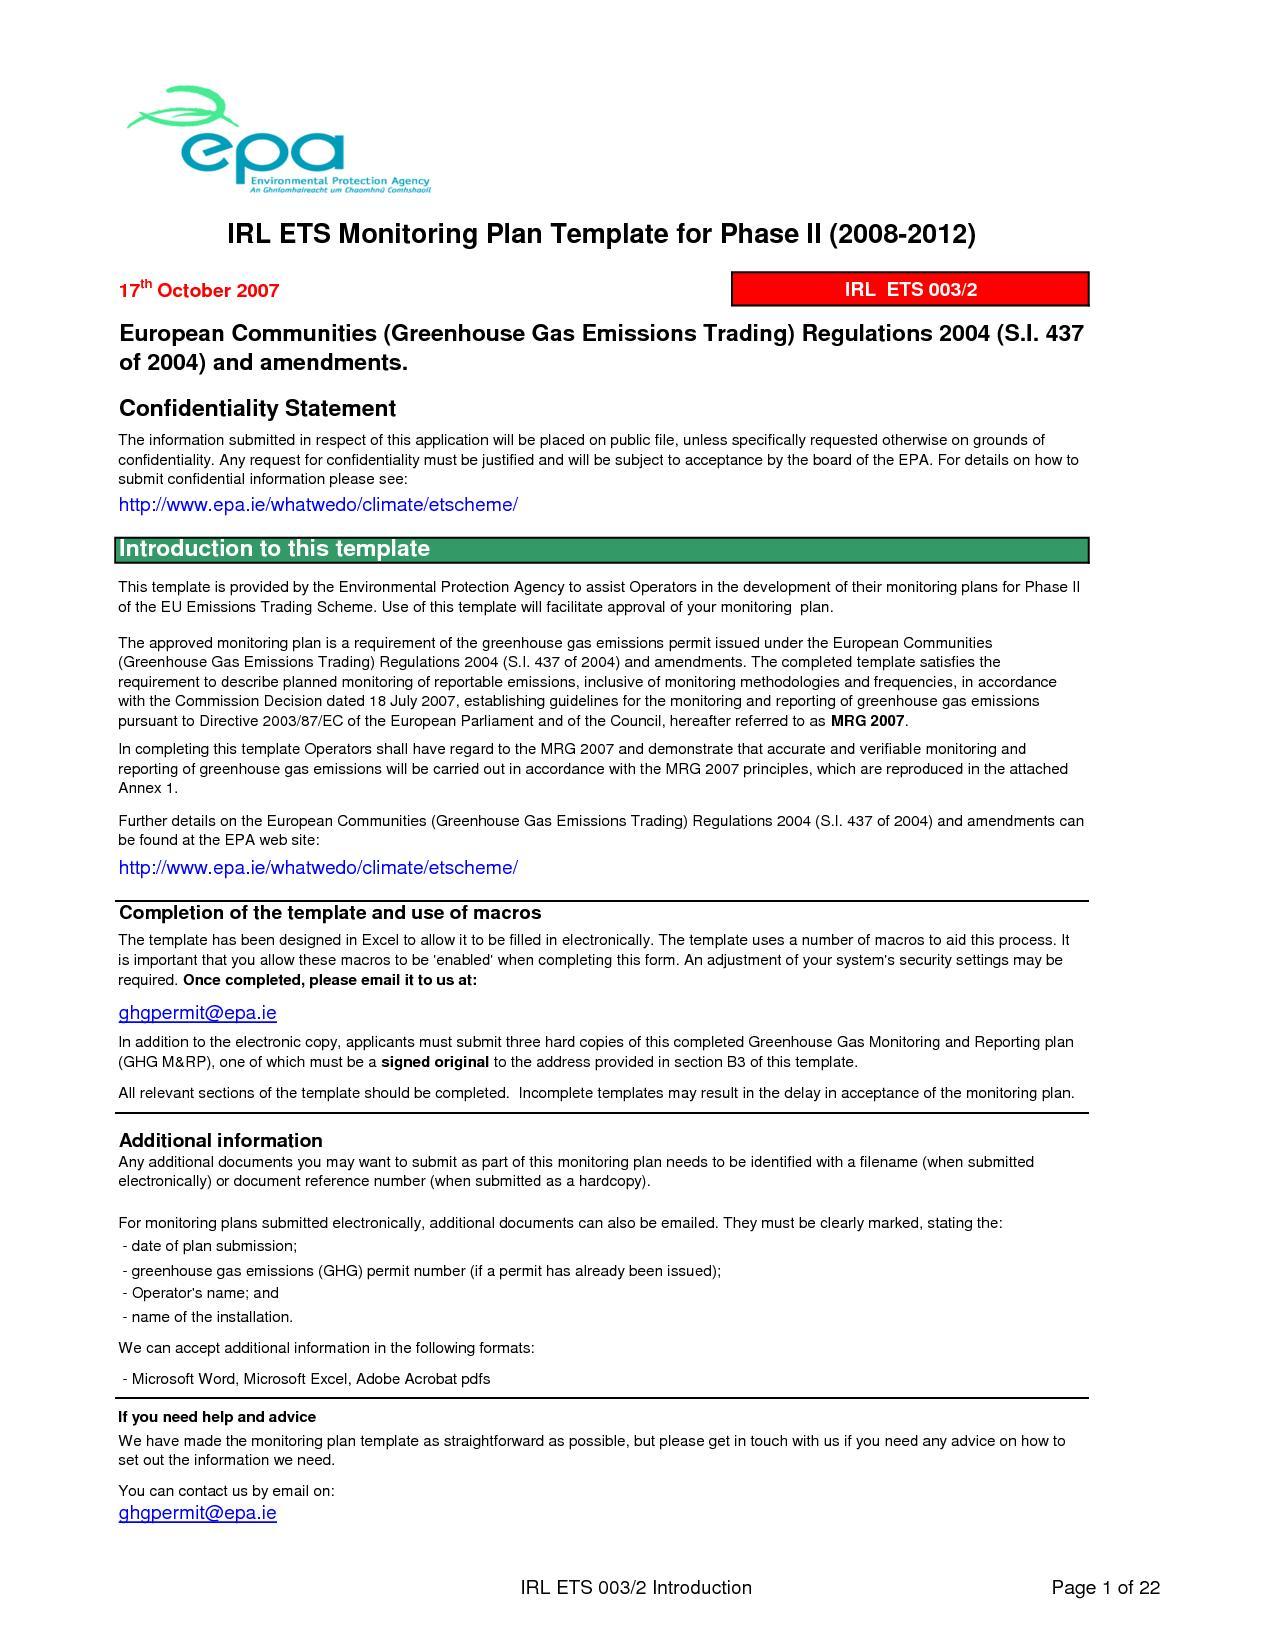 Free Job Proposal Template Samples